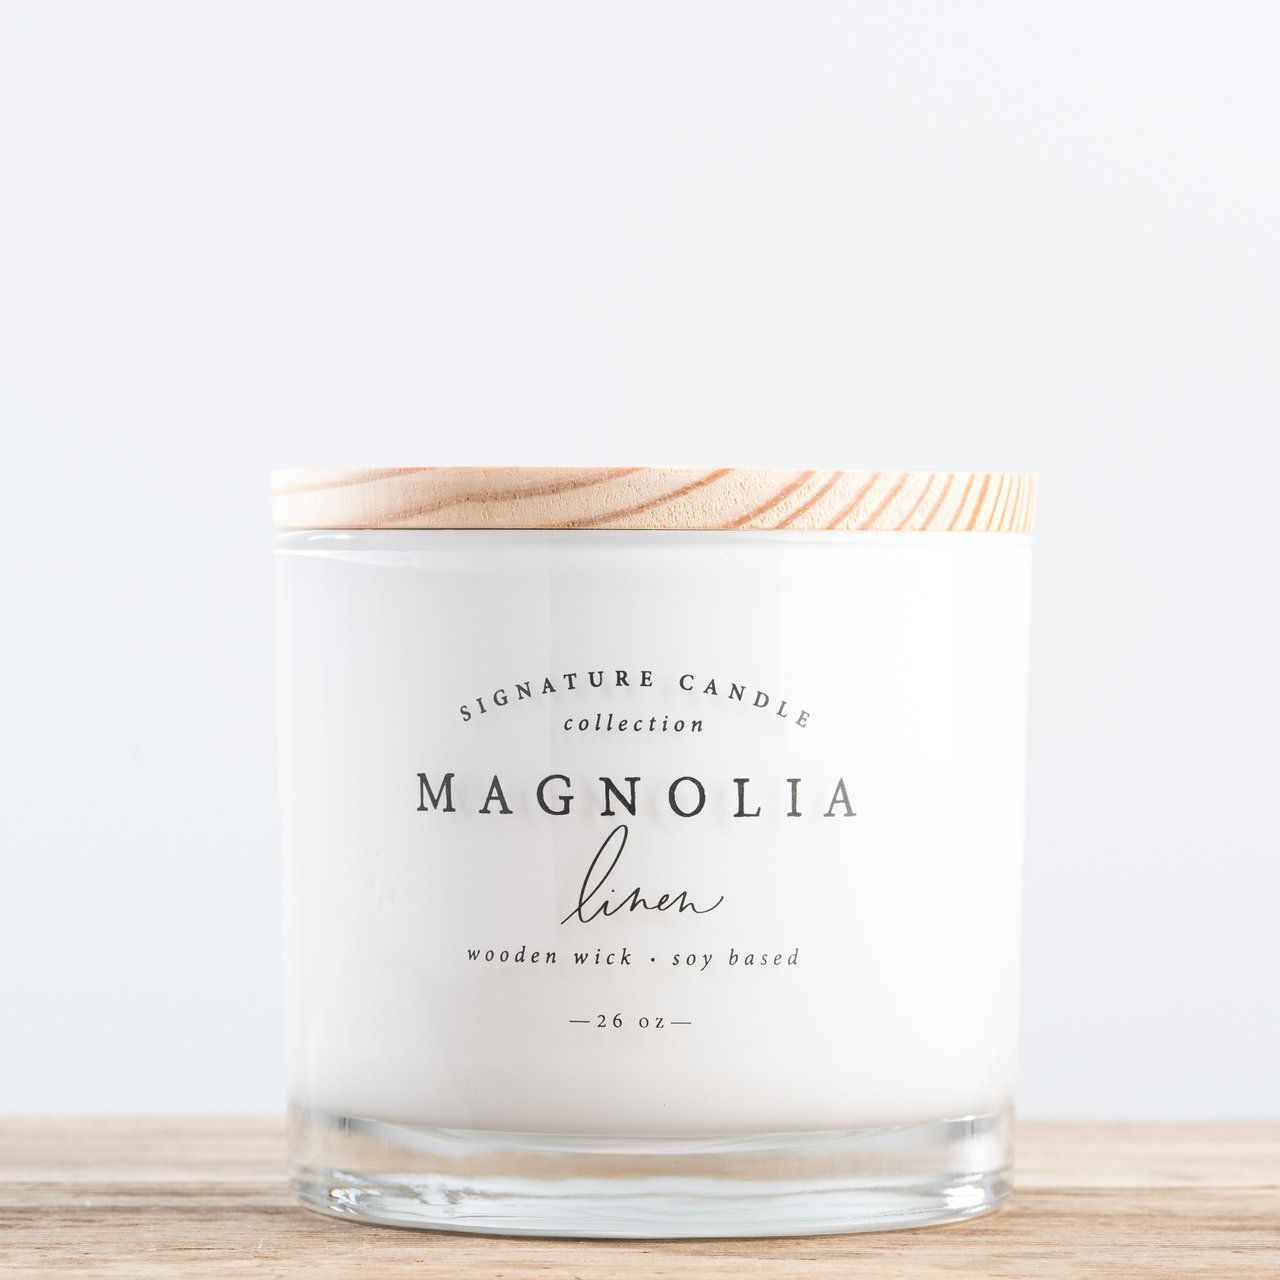 Magnolia Signature Candle Collection